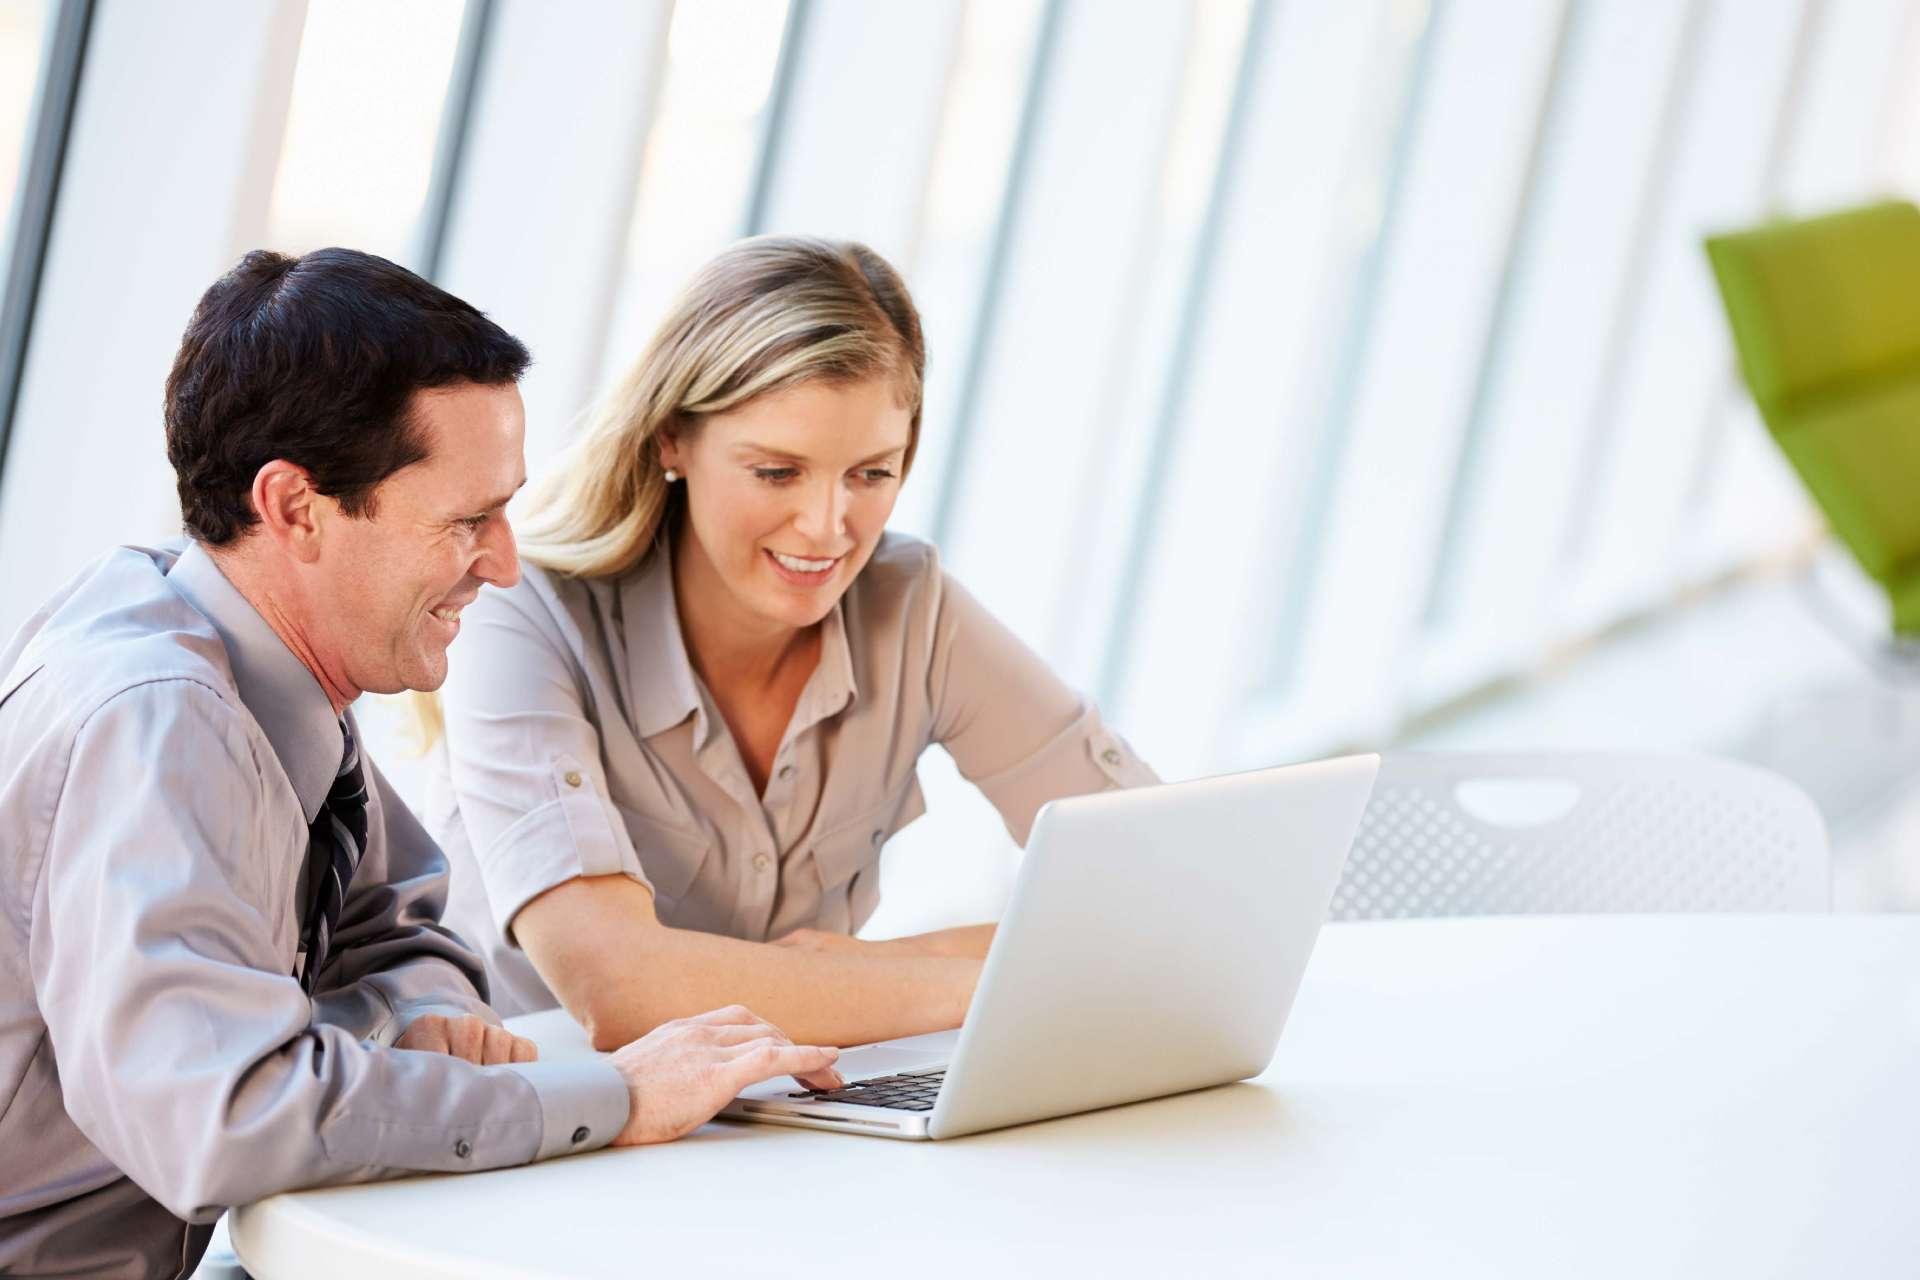 SmartTask and SmartTask Pro business people on laptop